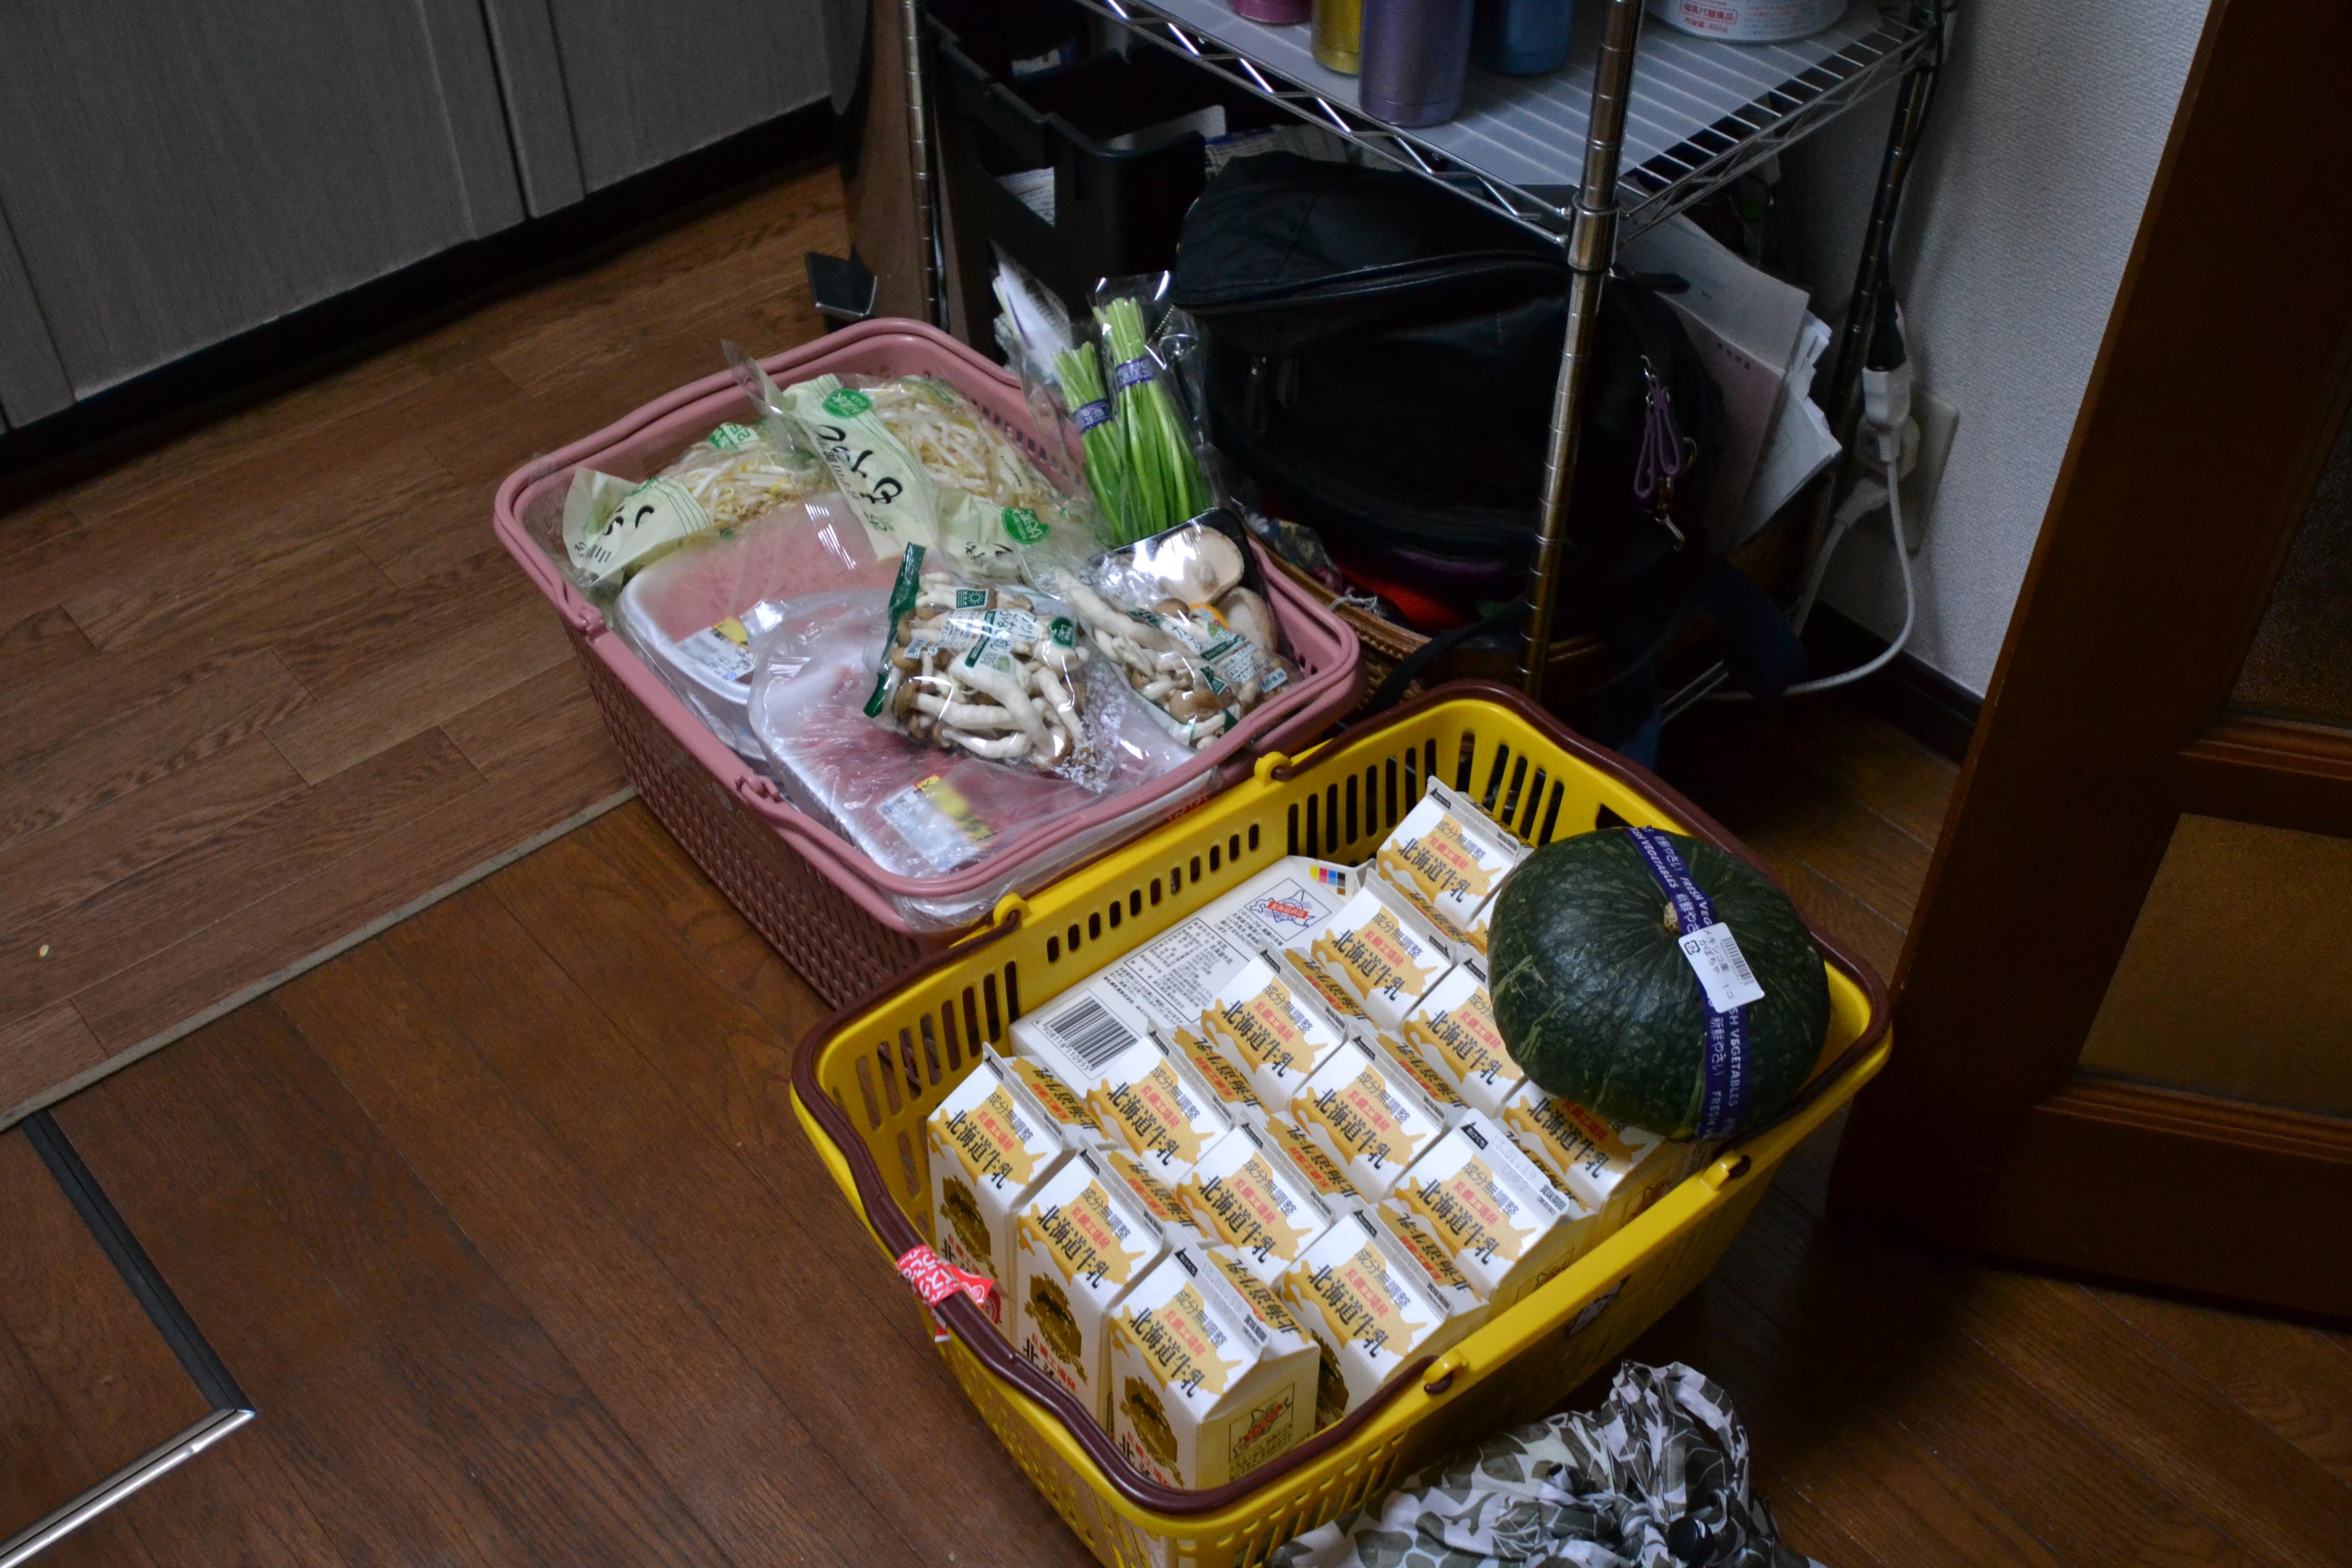 natori kumi's shopping trip basket.JPG